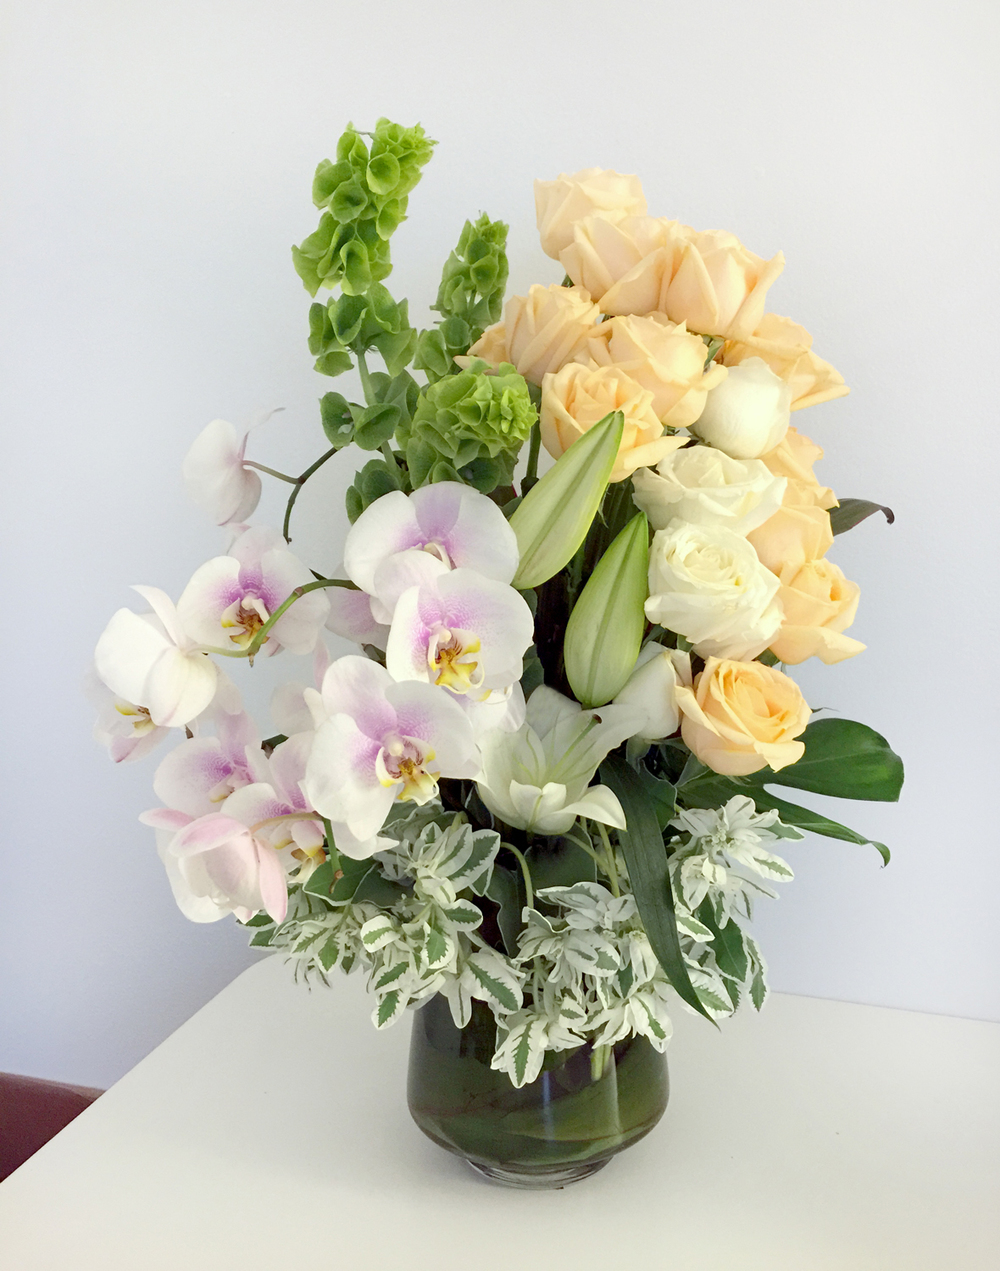 BITA sympathy flowers_02.JPG